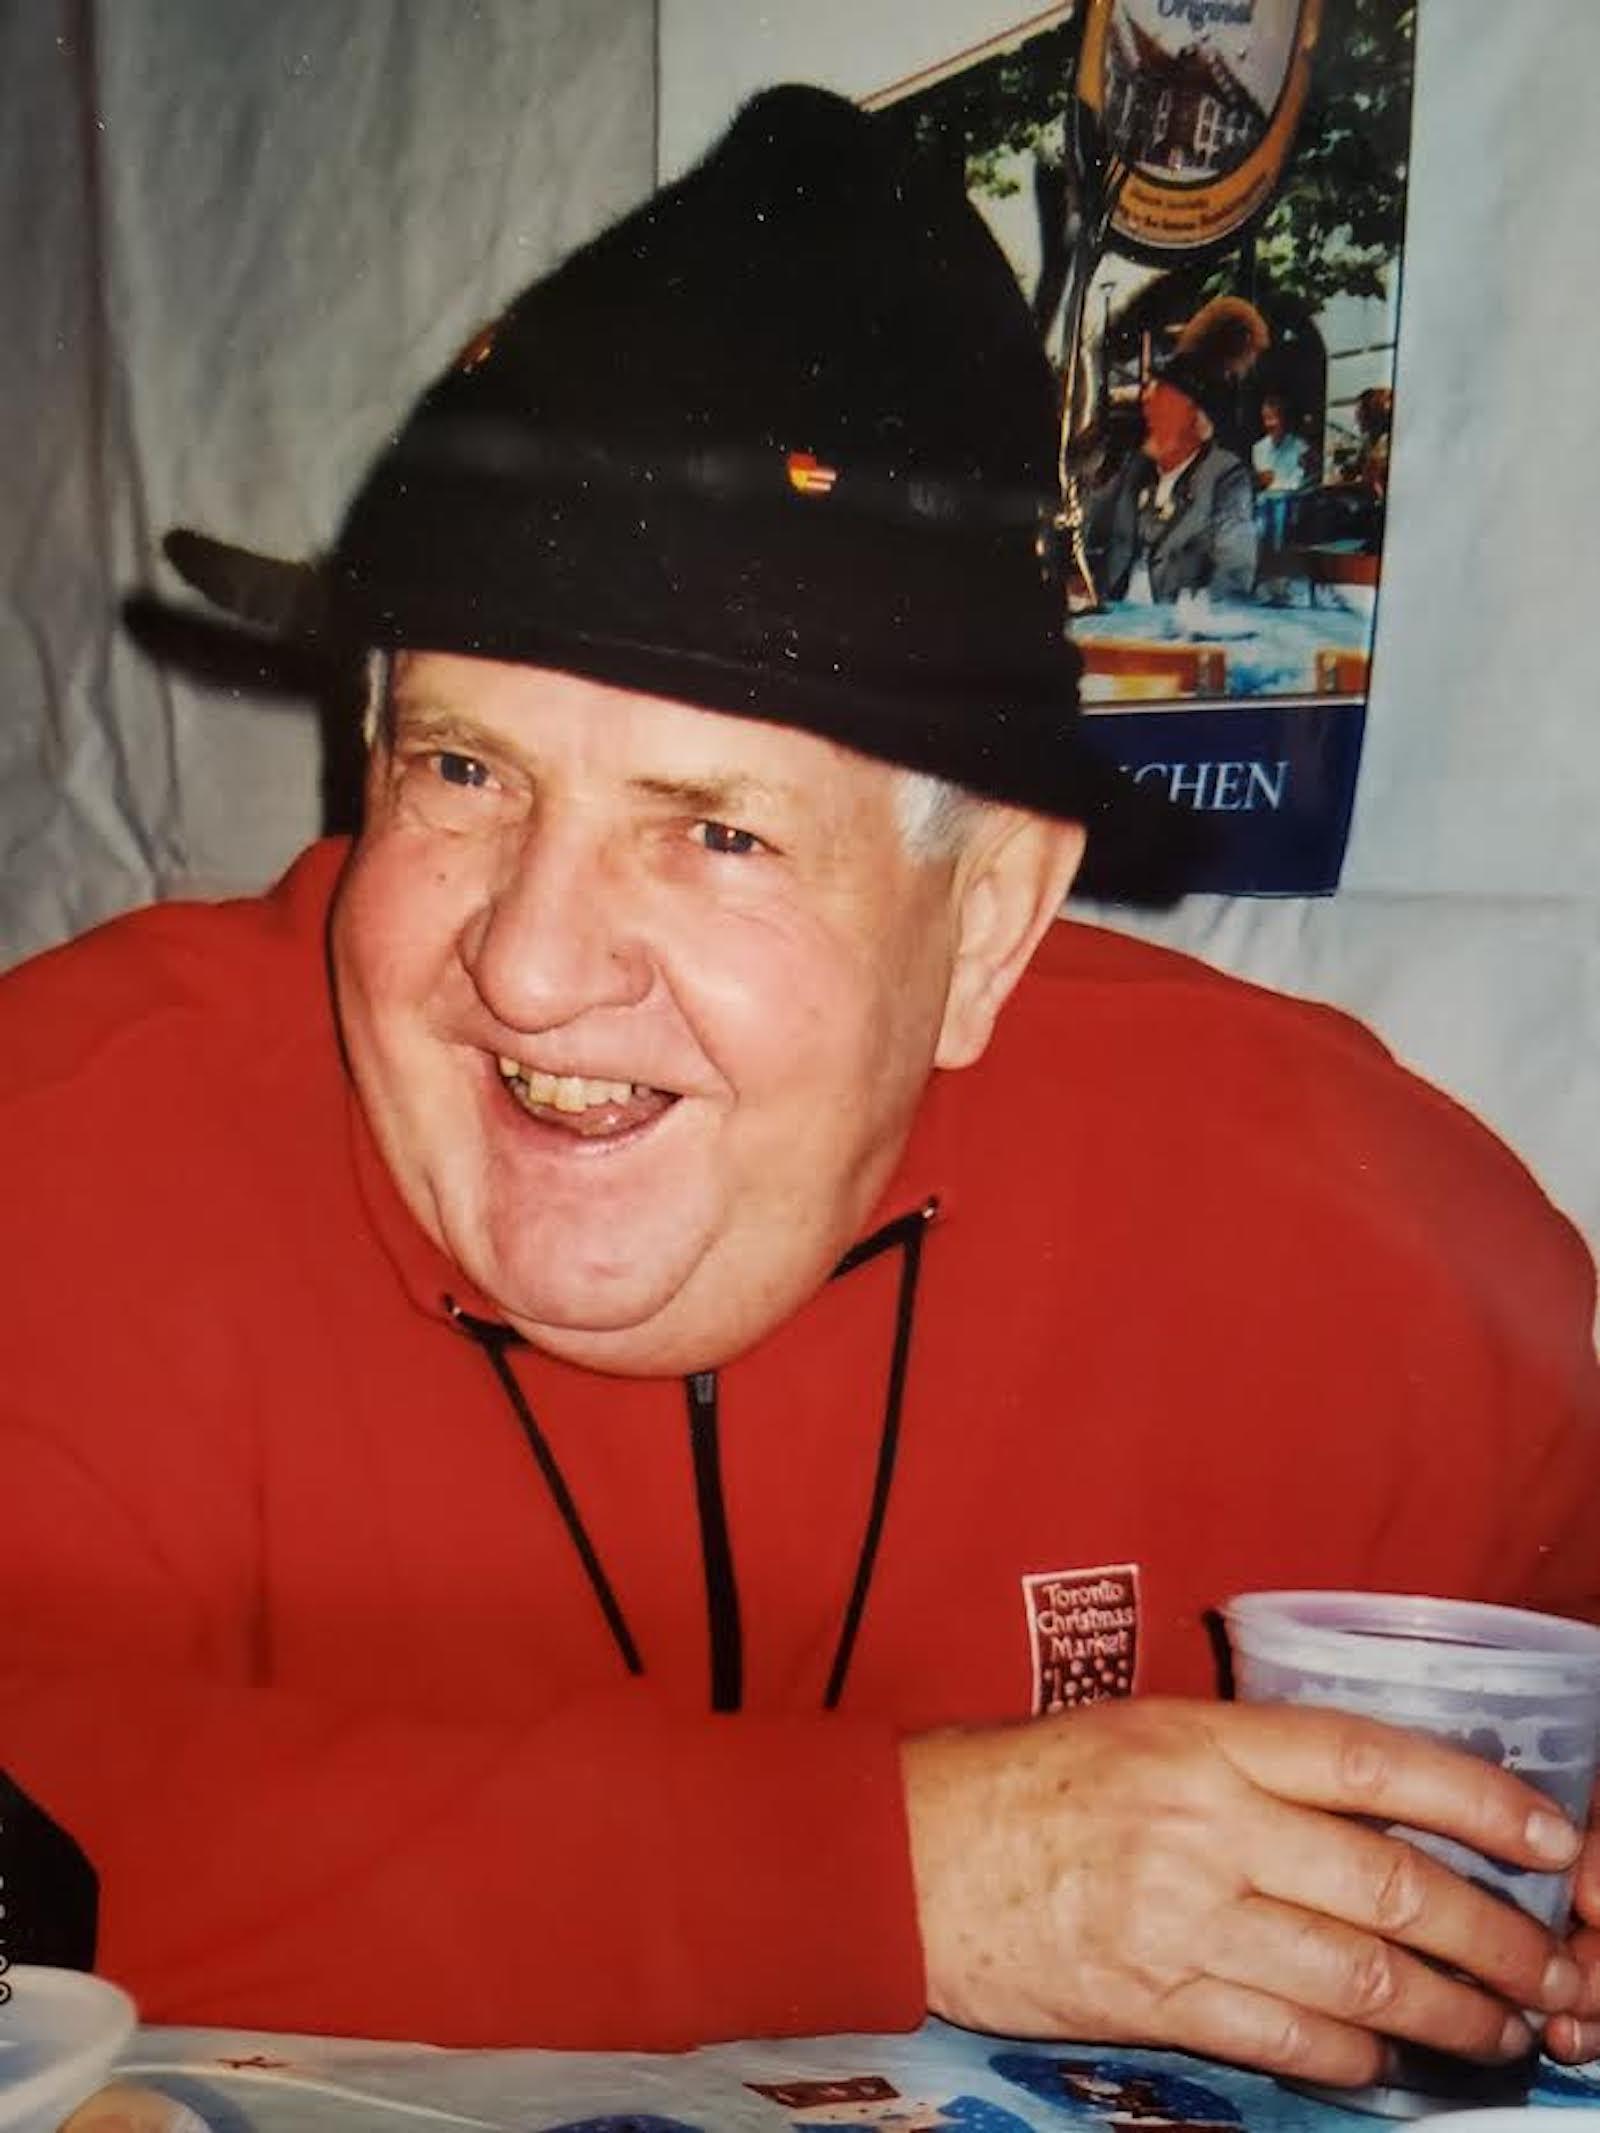 Ray Lotter, founder of Chicago's long-running Christkindlmarket.